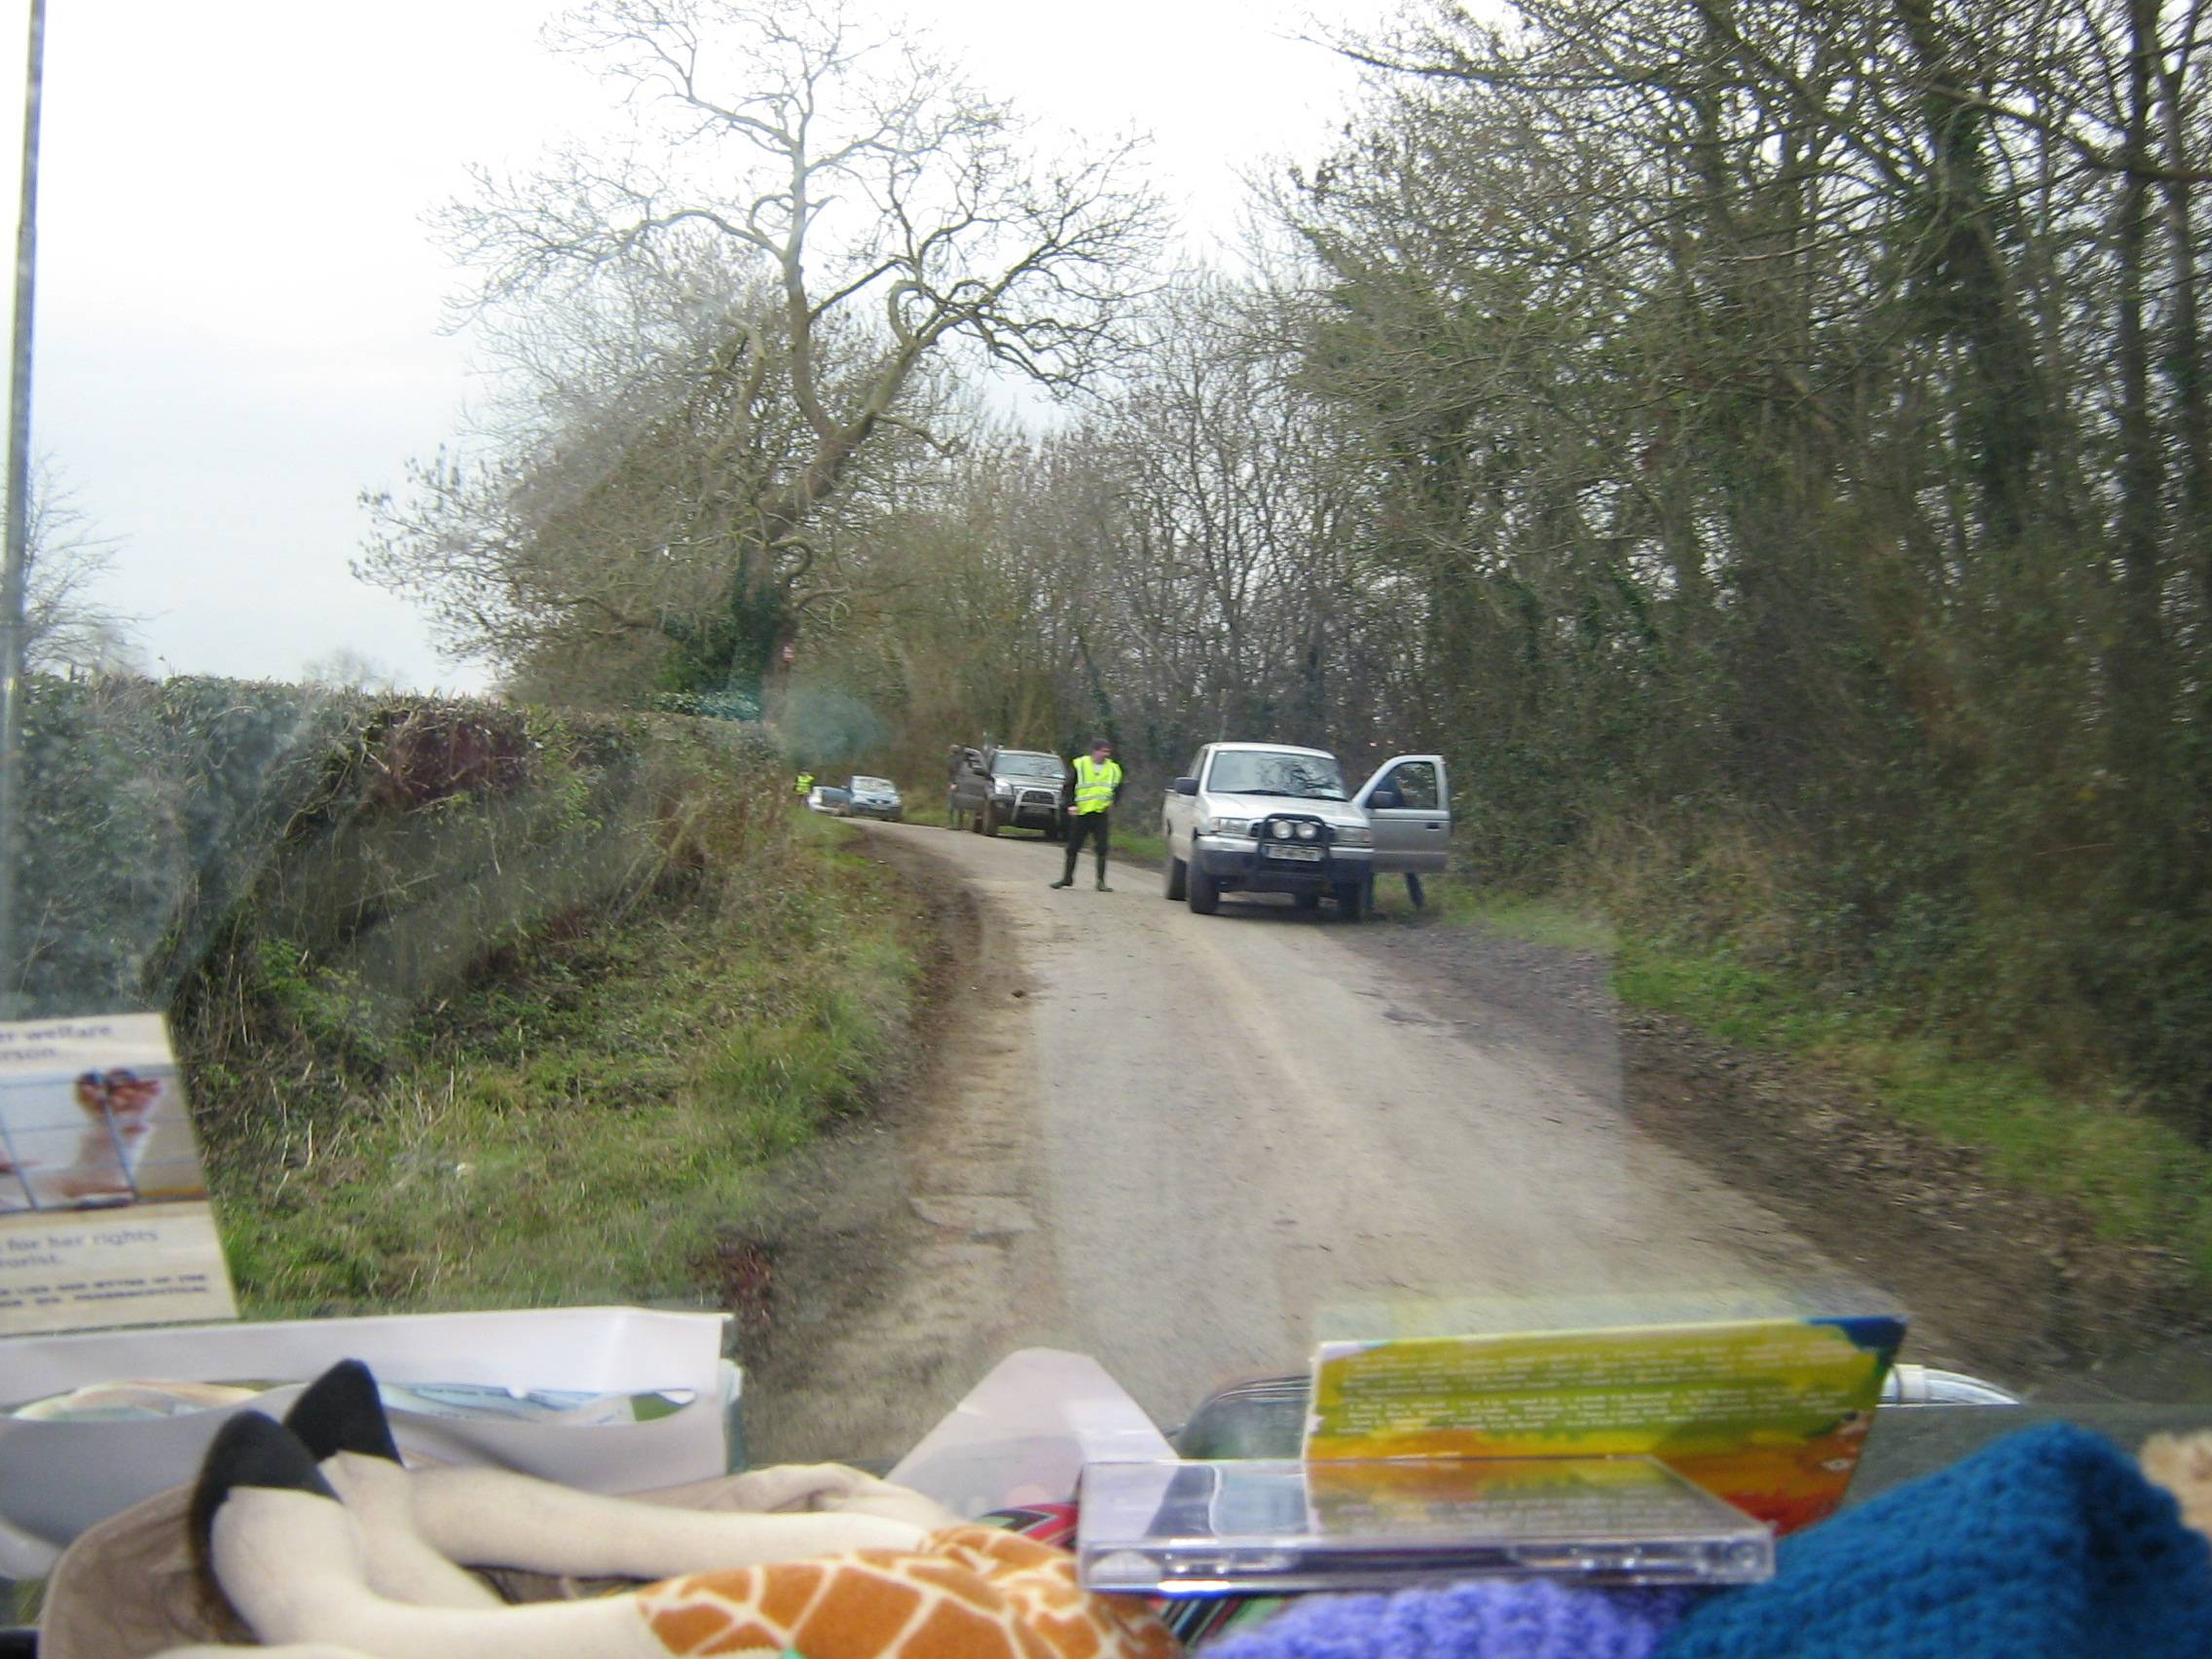 Blocking roads again